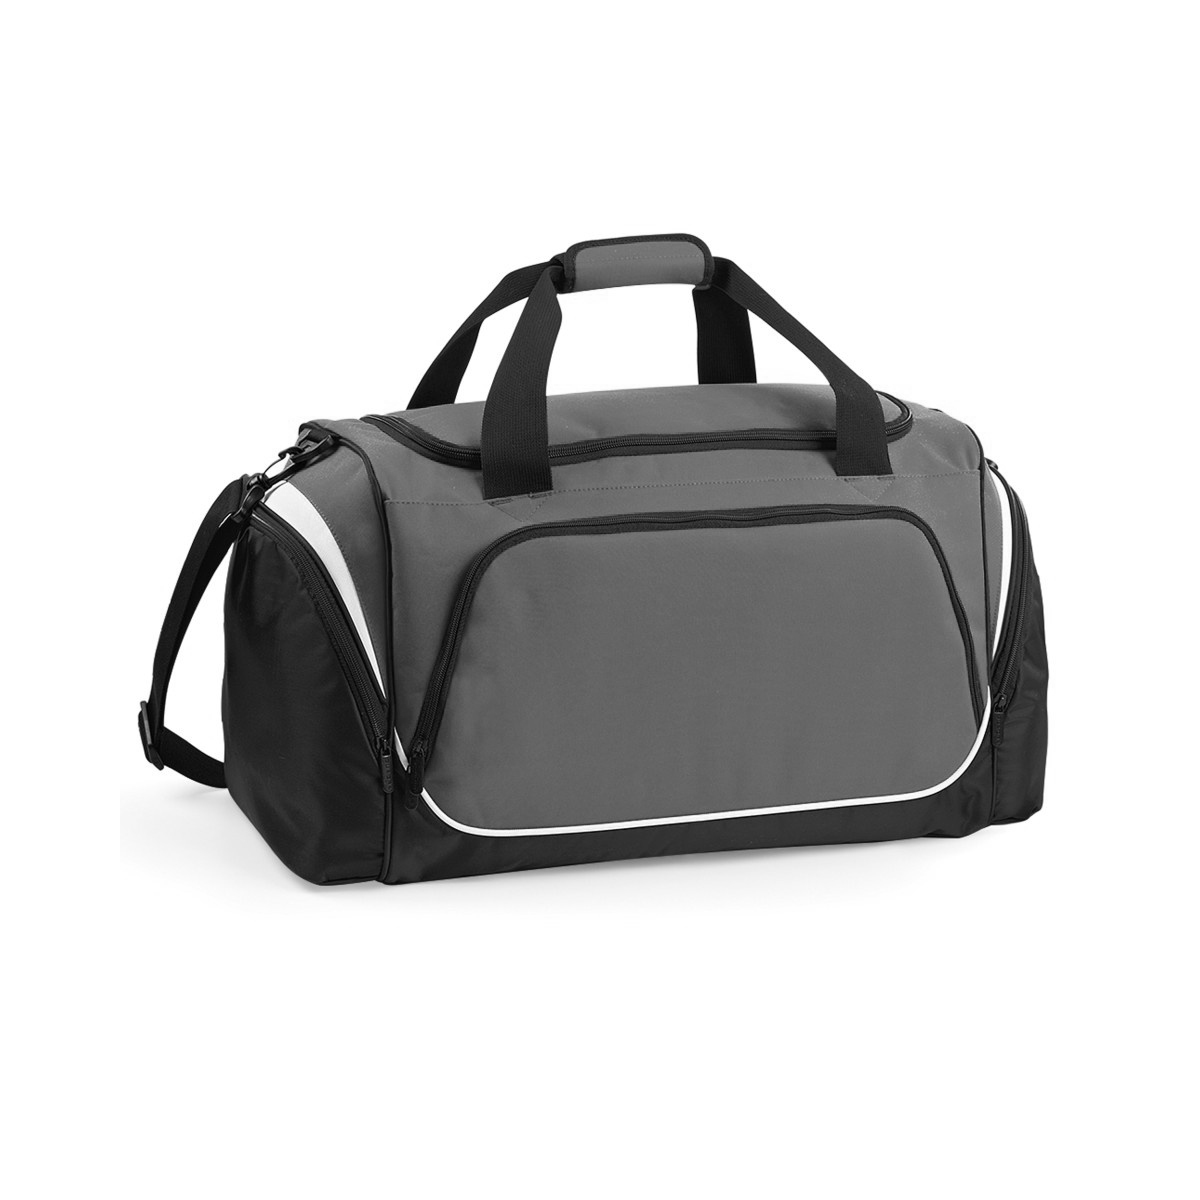 Quadra Pro Team Holdall / Duffle Bag (55 Litres) (Pack of 2) (One Size) (Graphite/Black/White)